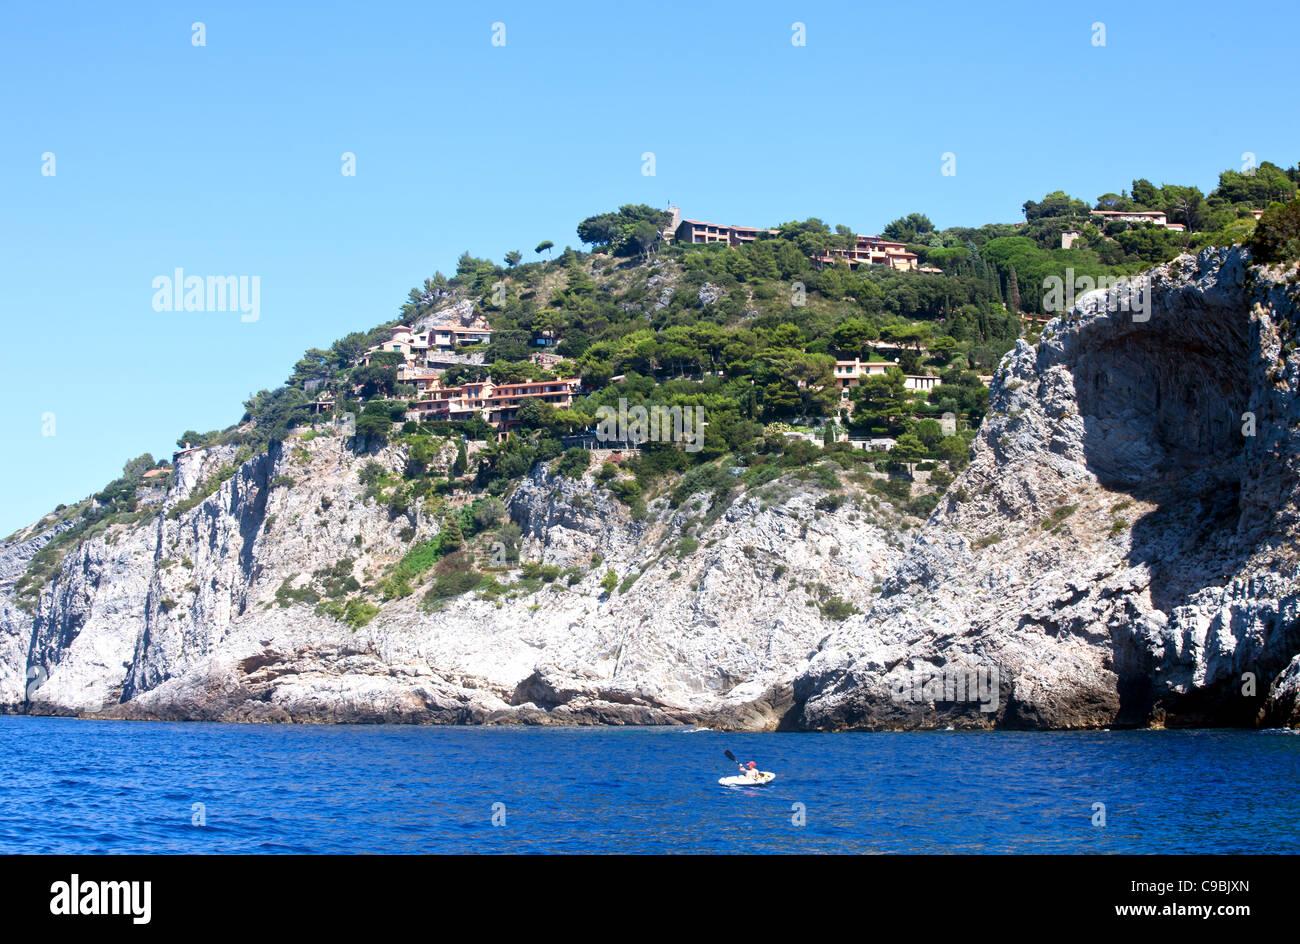 Coast of Monte Argentario, Tuscany, Italy. - Stock Image